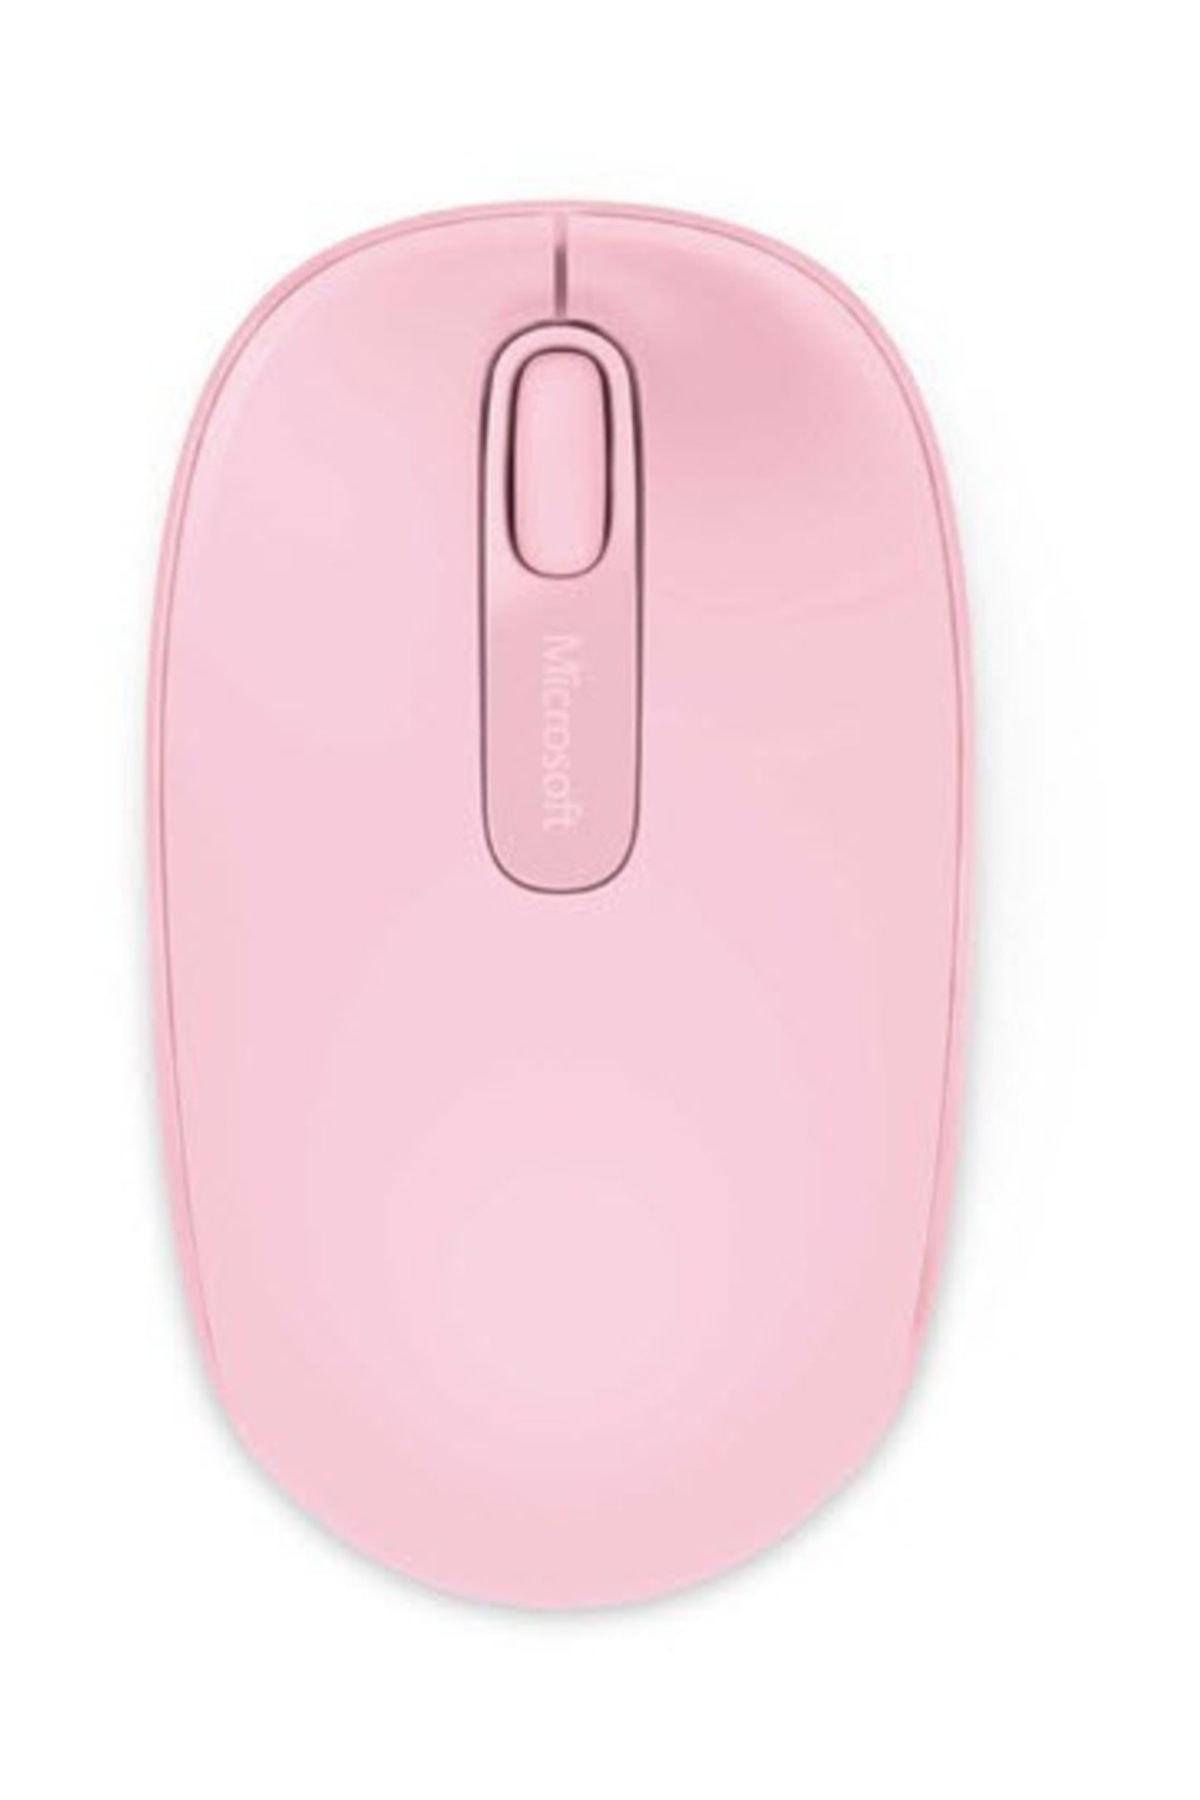 MICROSOFT Mobile 1850 Kablosuz Pembe Mouse (U7Z-00023) 1